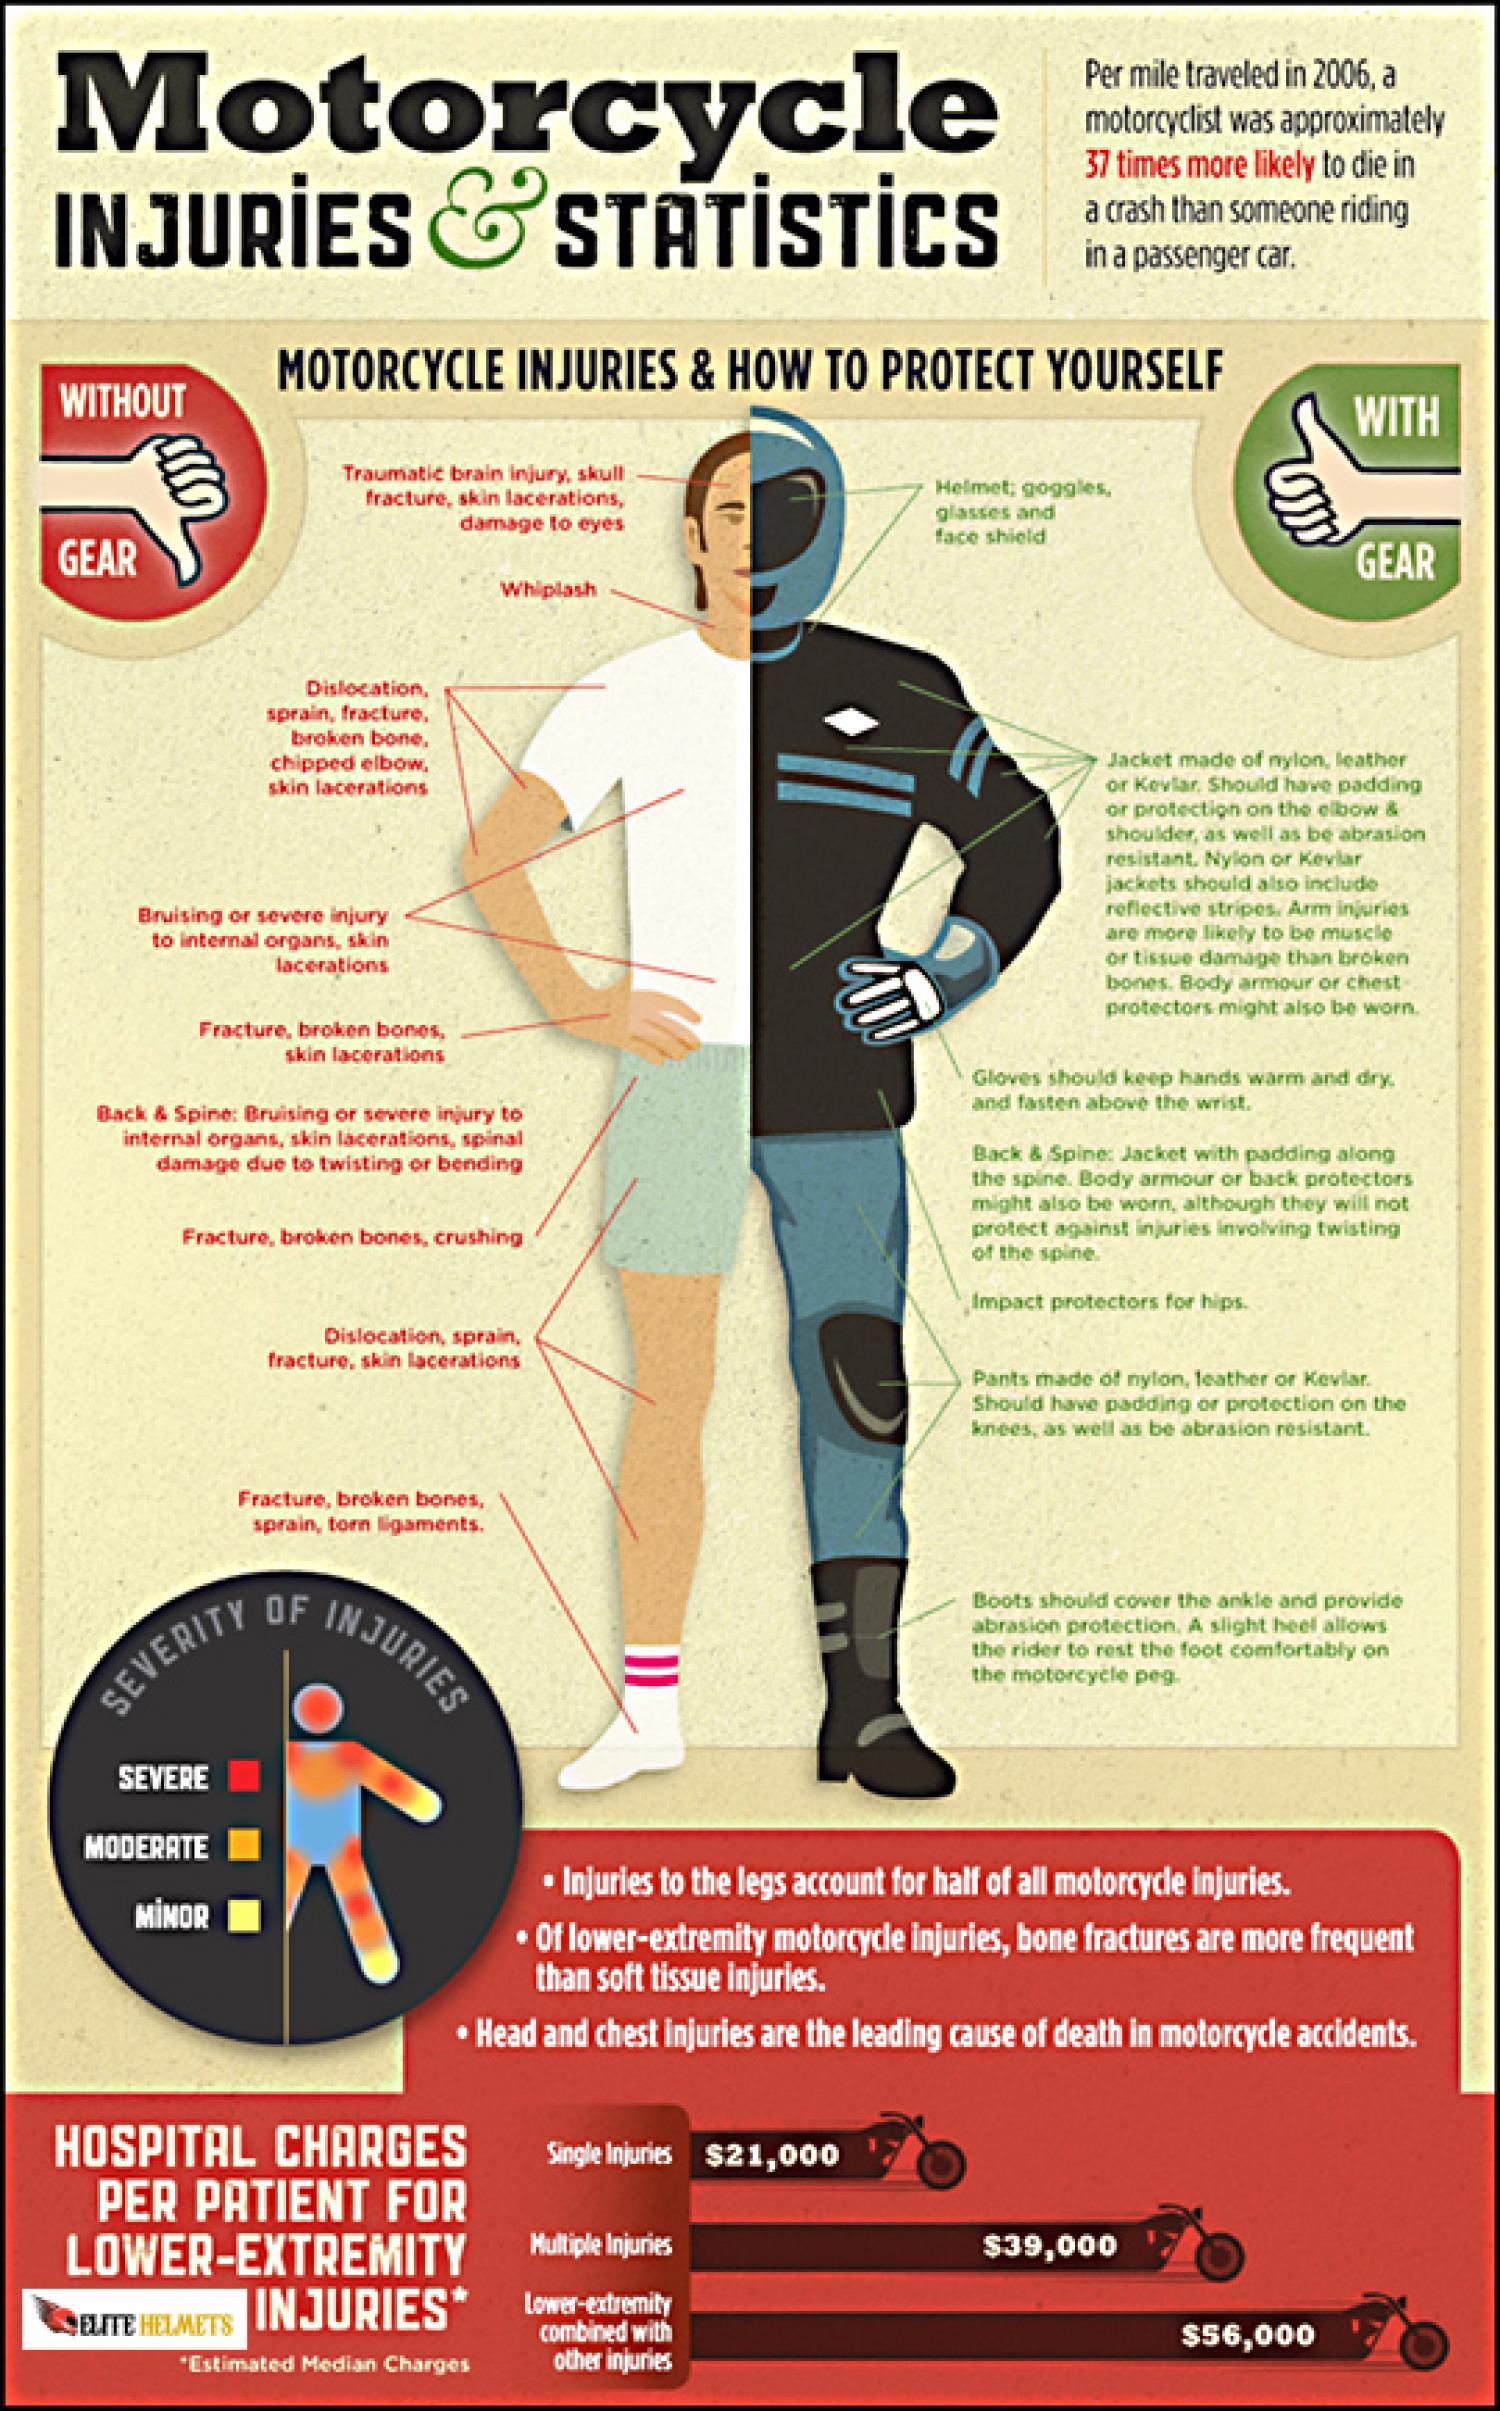 Motorcycle Injuries Infographic Car insurance, Injury